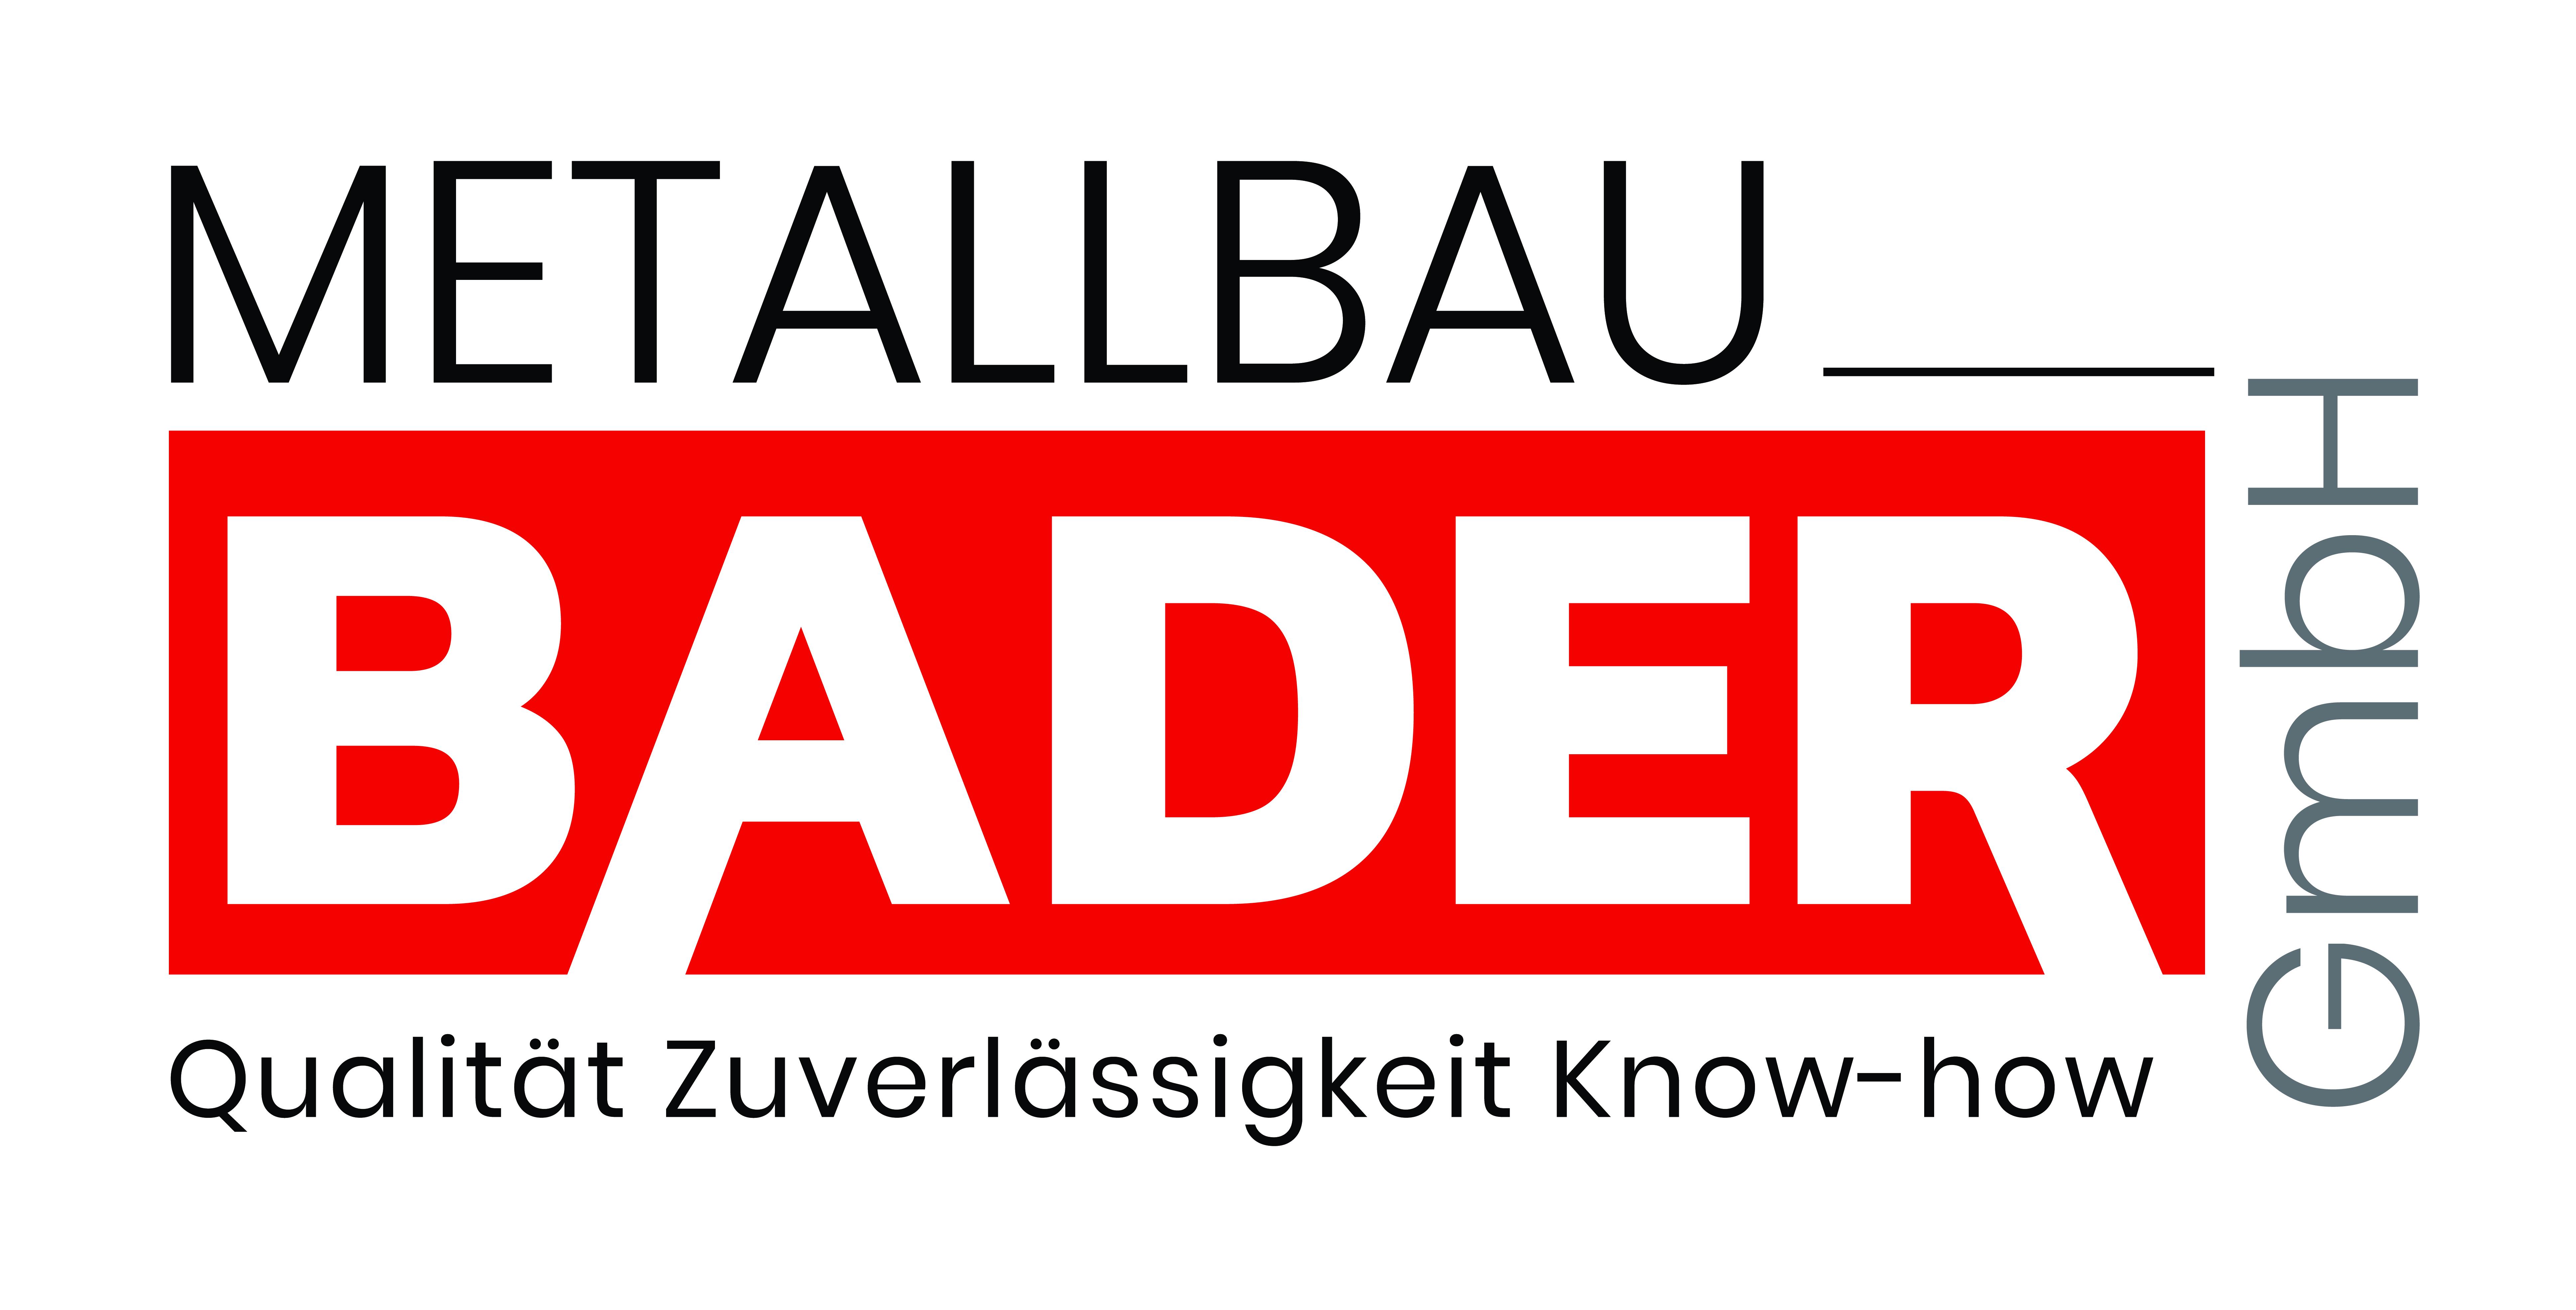 Metallbau Bader GmbH